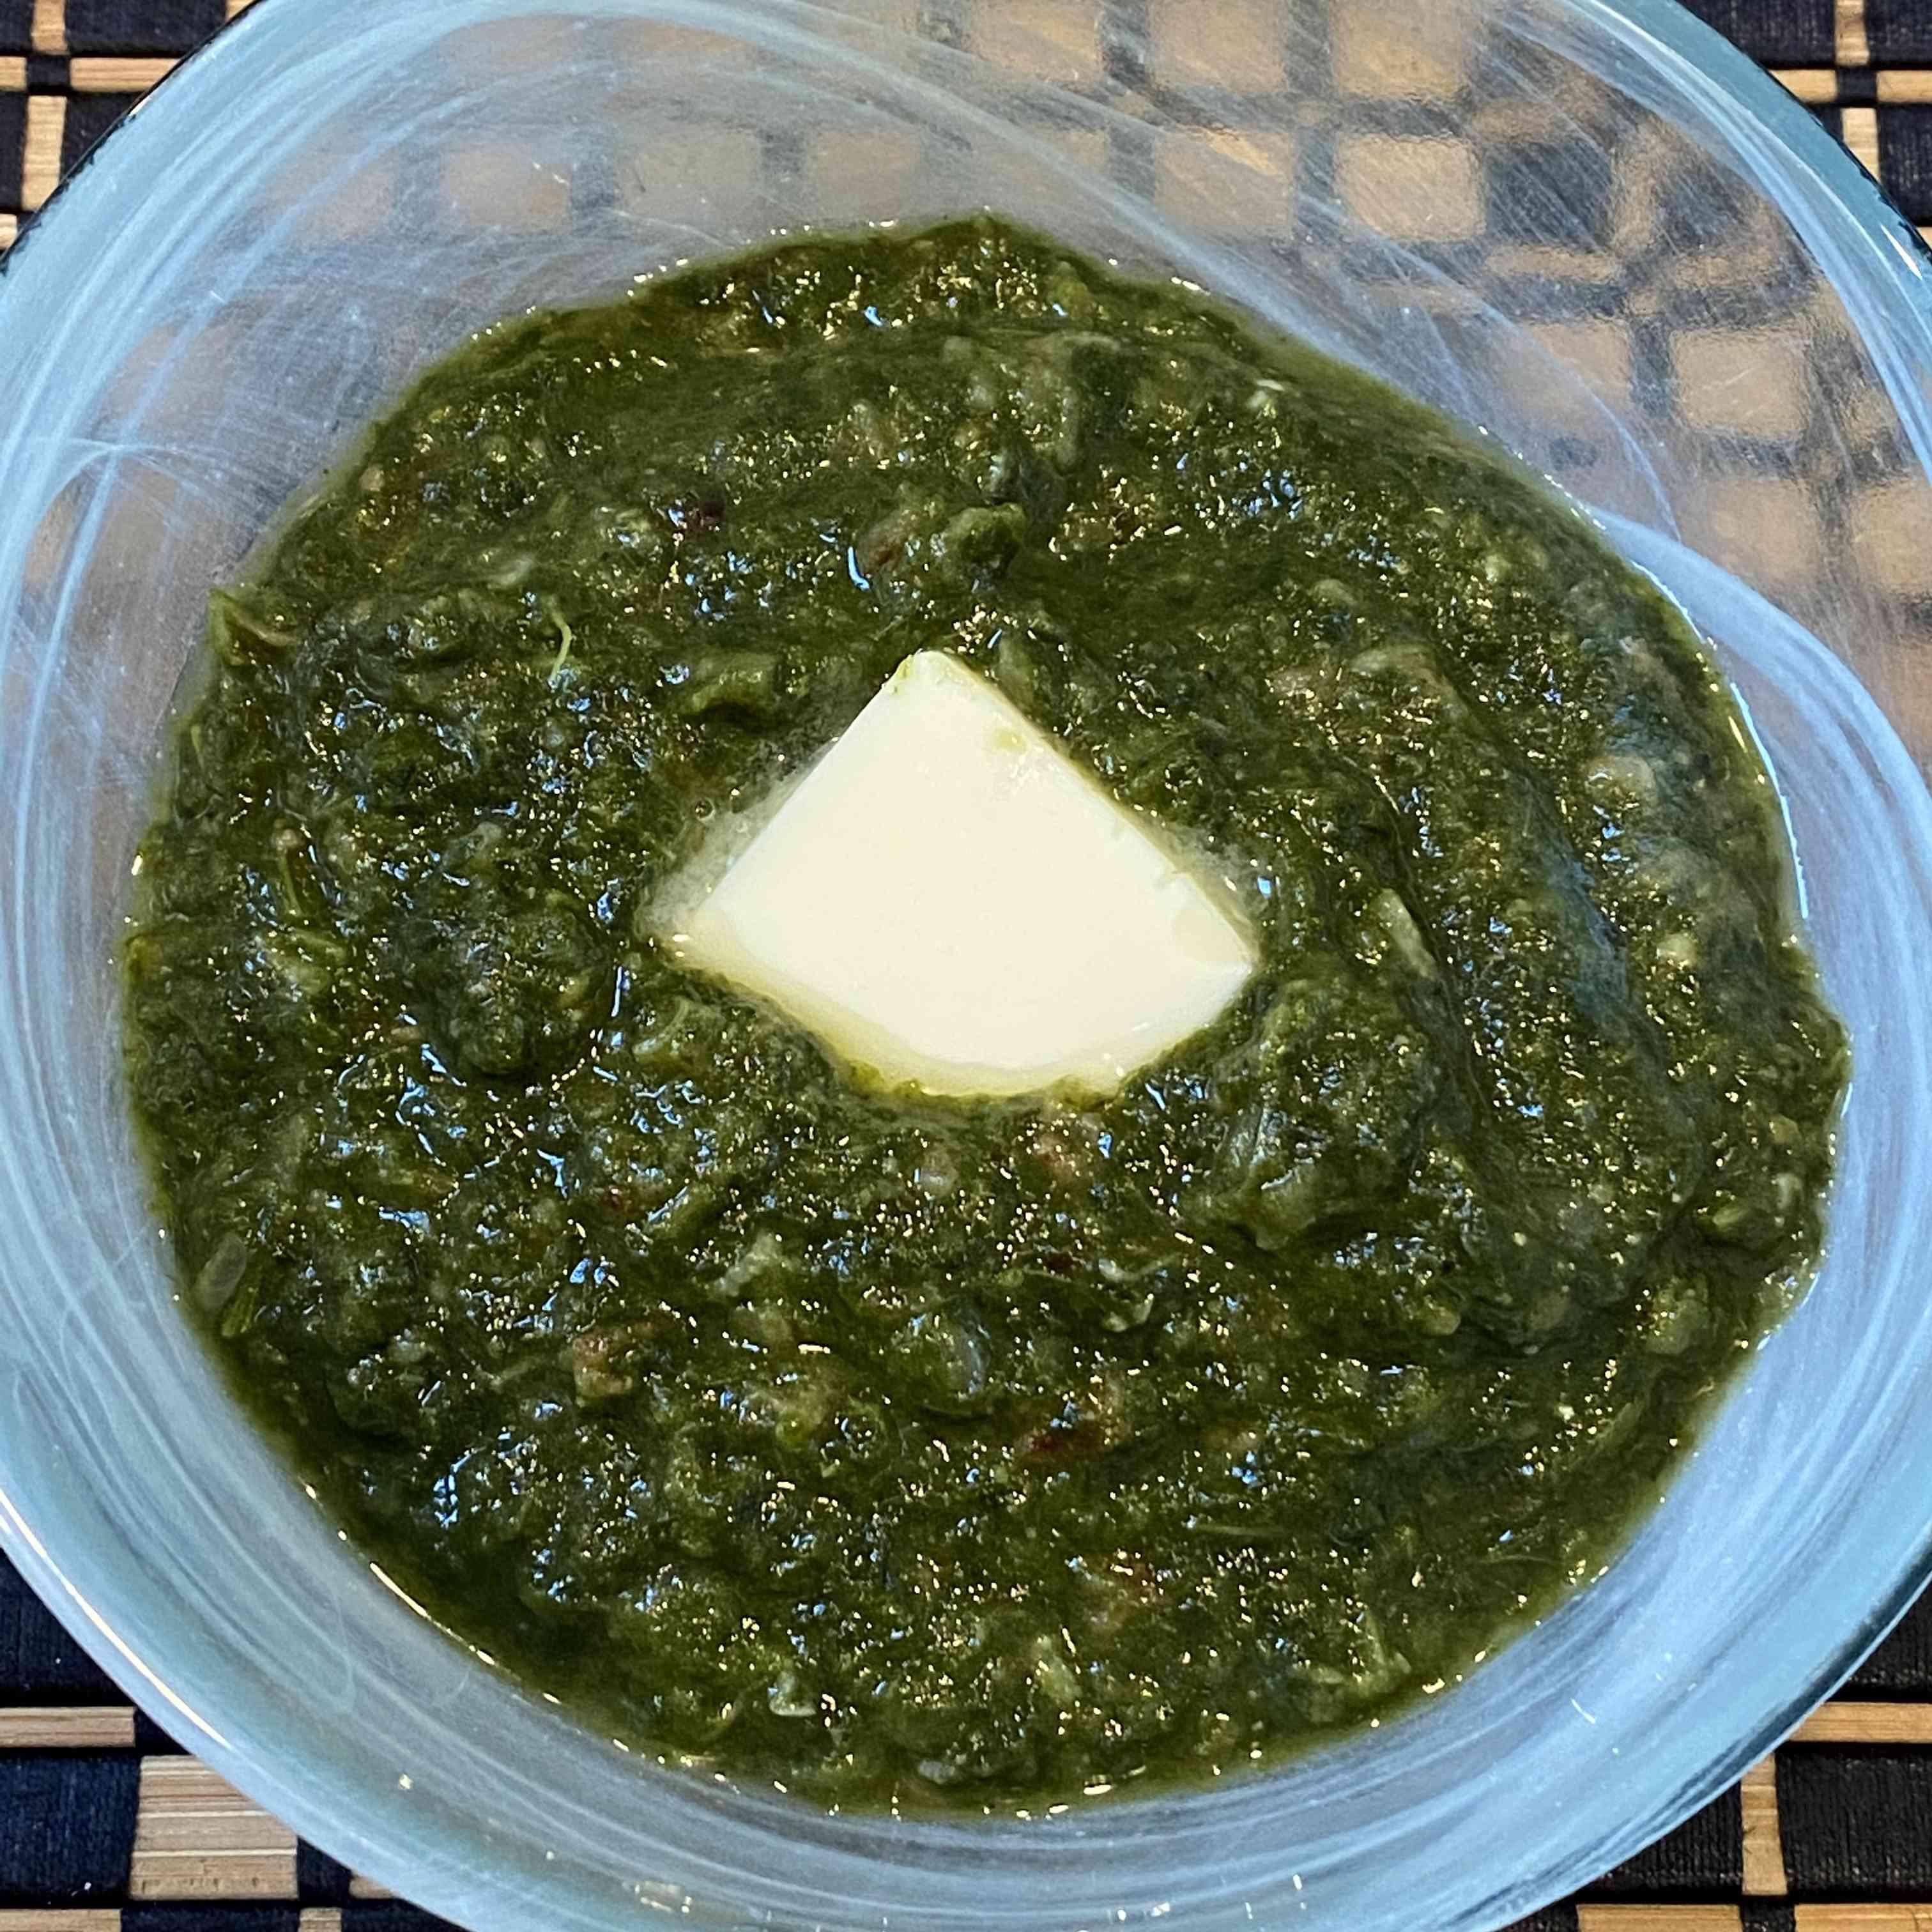 Punjabi Sarson Ka Saag (Greens and Spices) Recipe Test